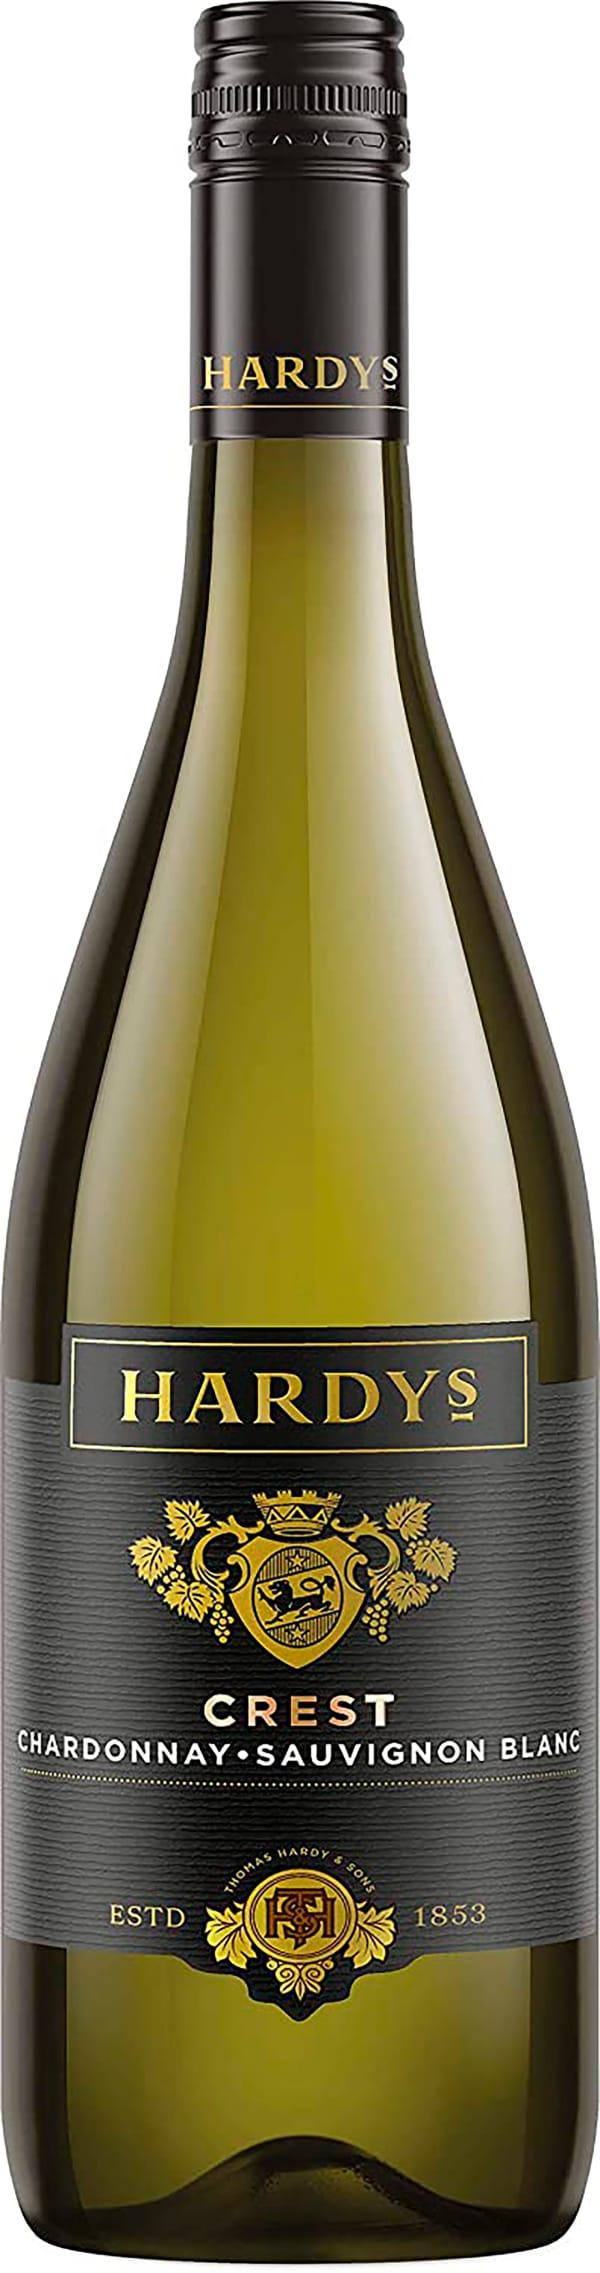 Hardys Crest Chardonnay Sauvignon Blanc 2016